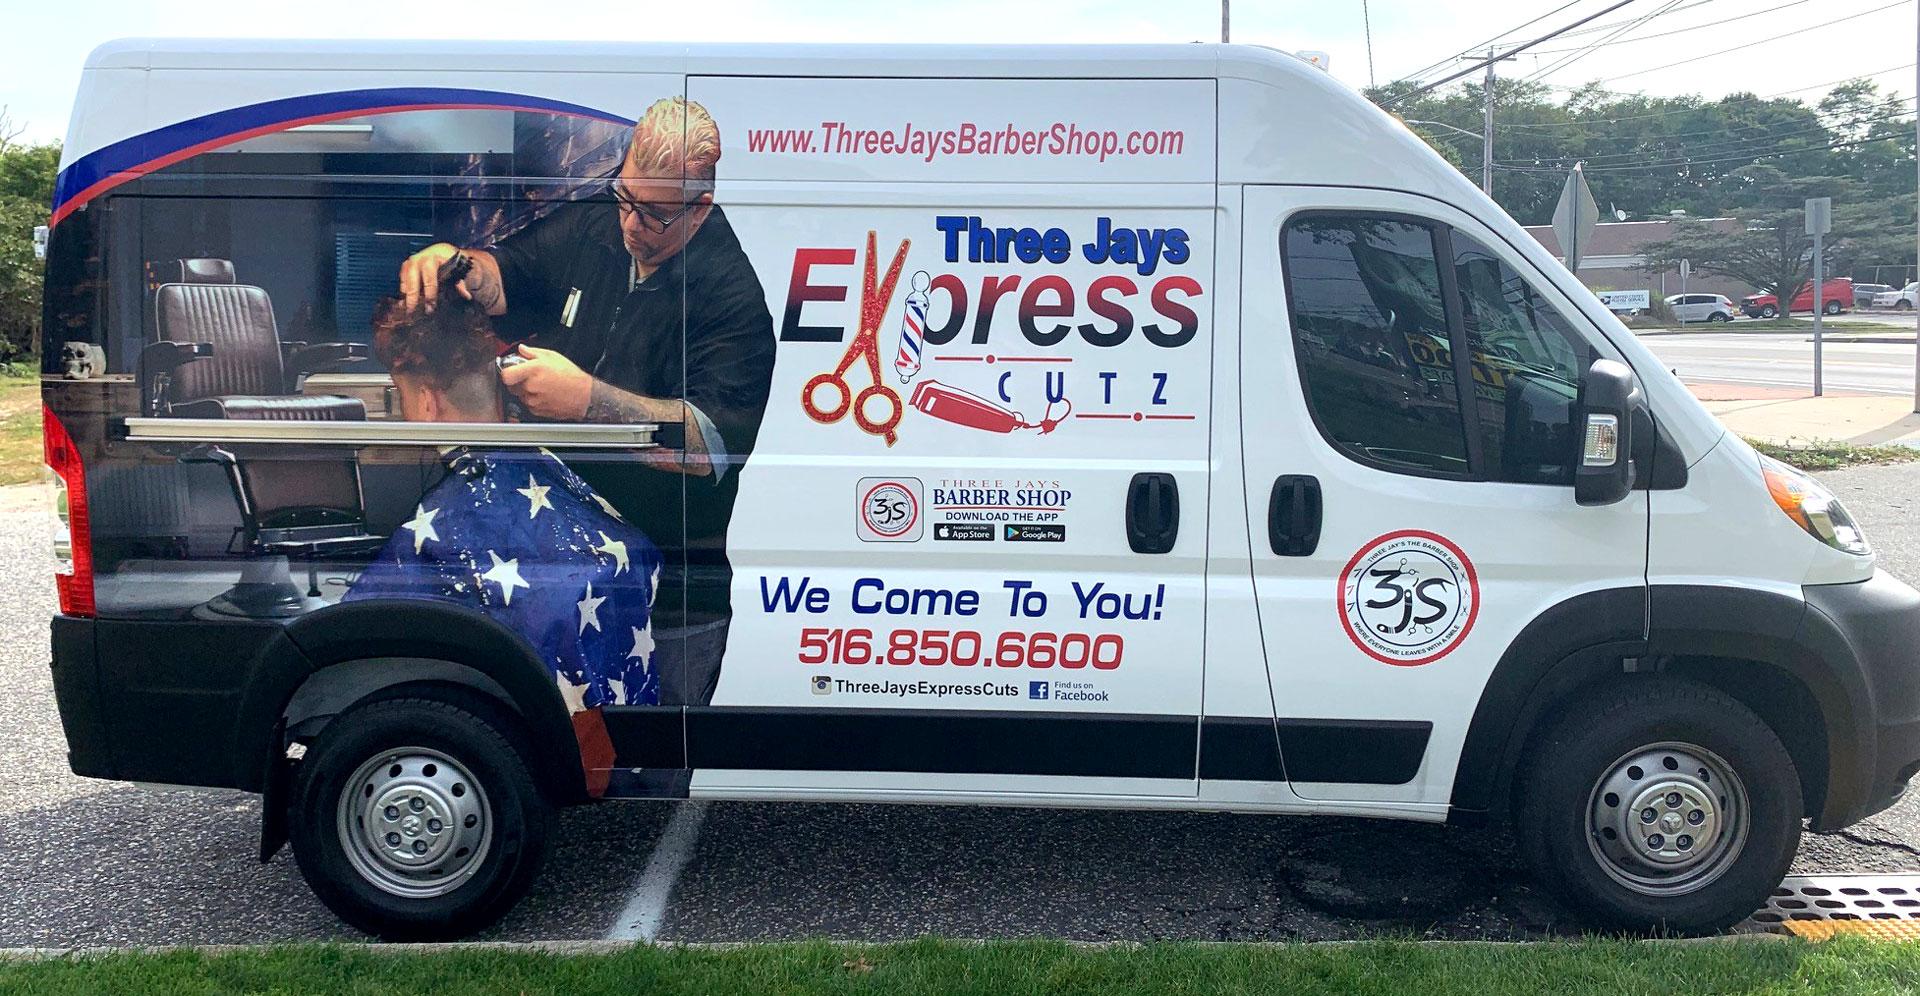 Three Jays Express Cutz vehicle lettering